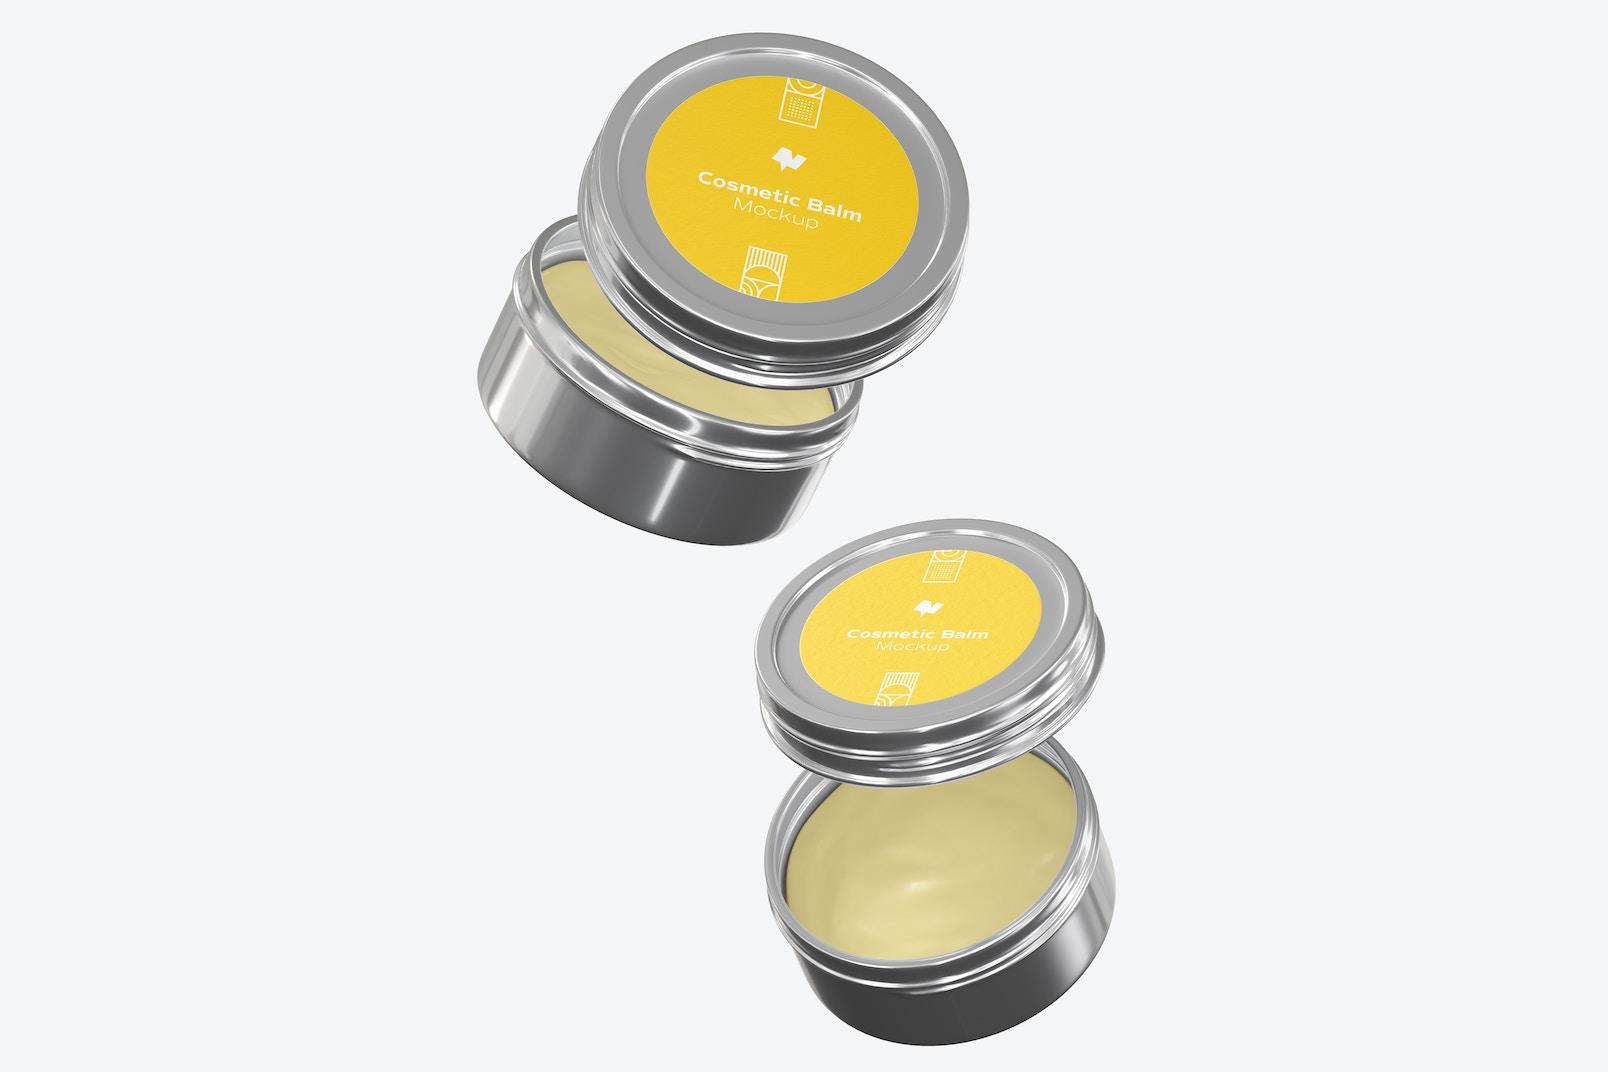 Metallic Cosmetic Balm Packaging Mockup, Floating